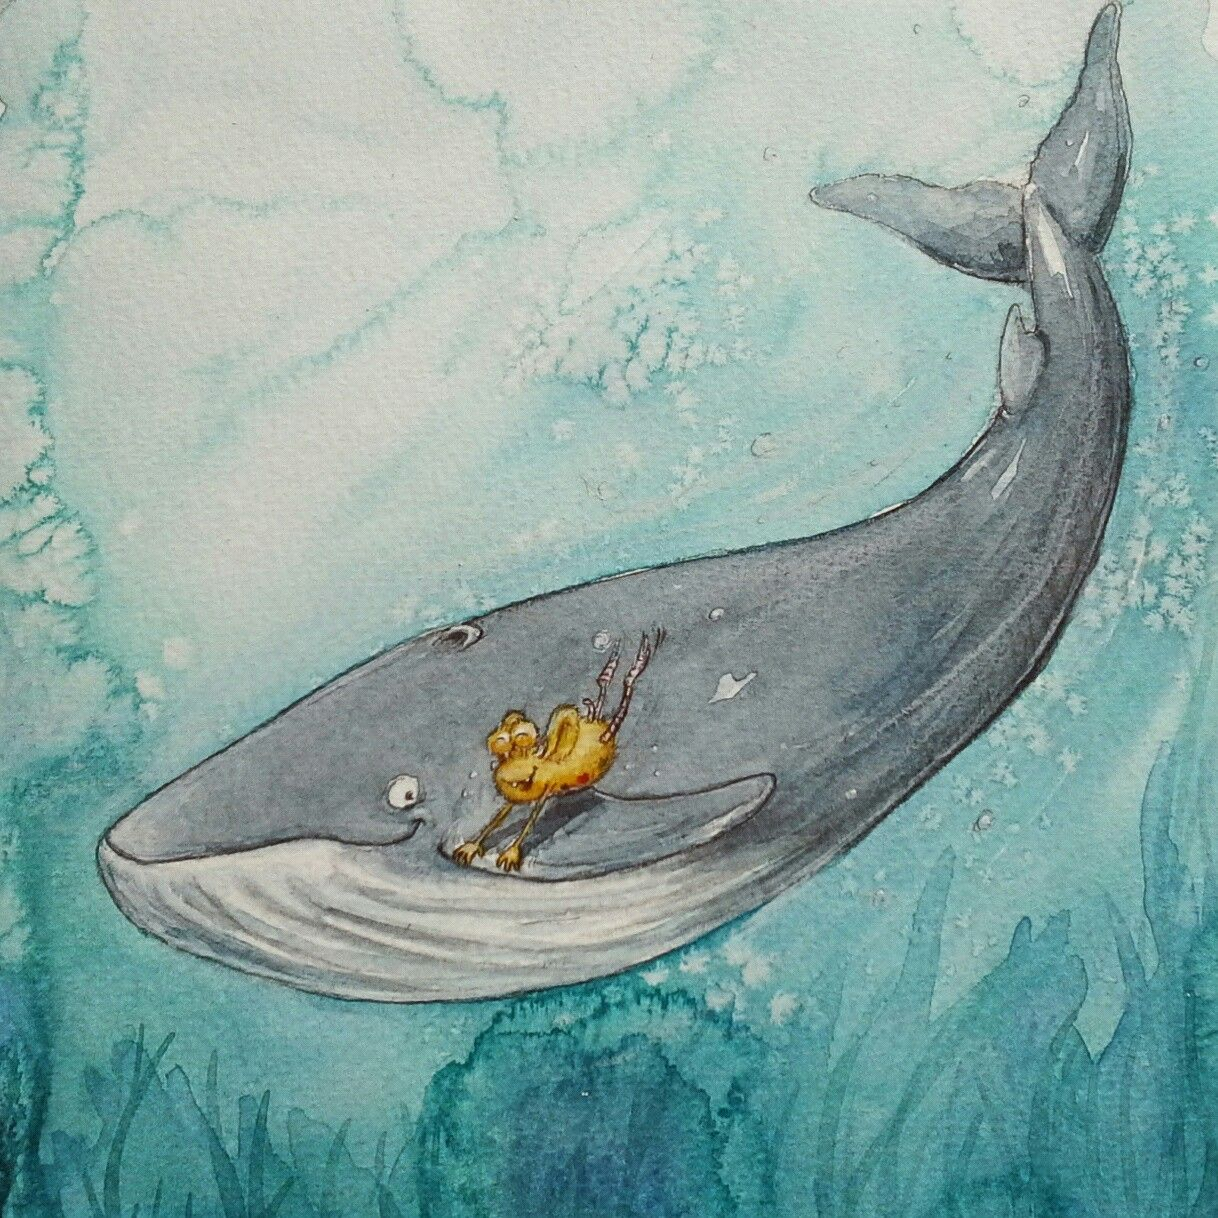 Pin Auf Illus Kinderbuch Aquarell